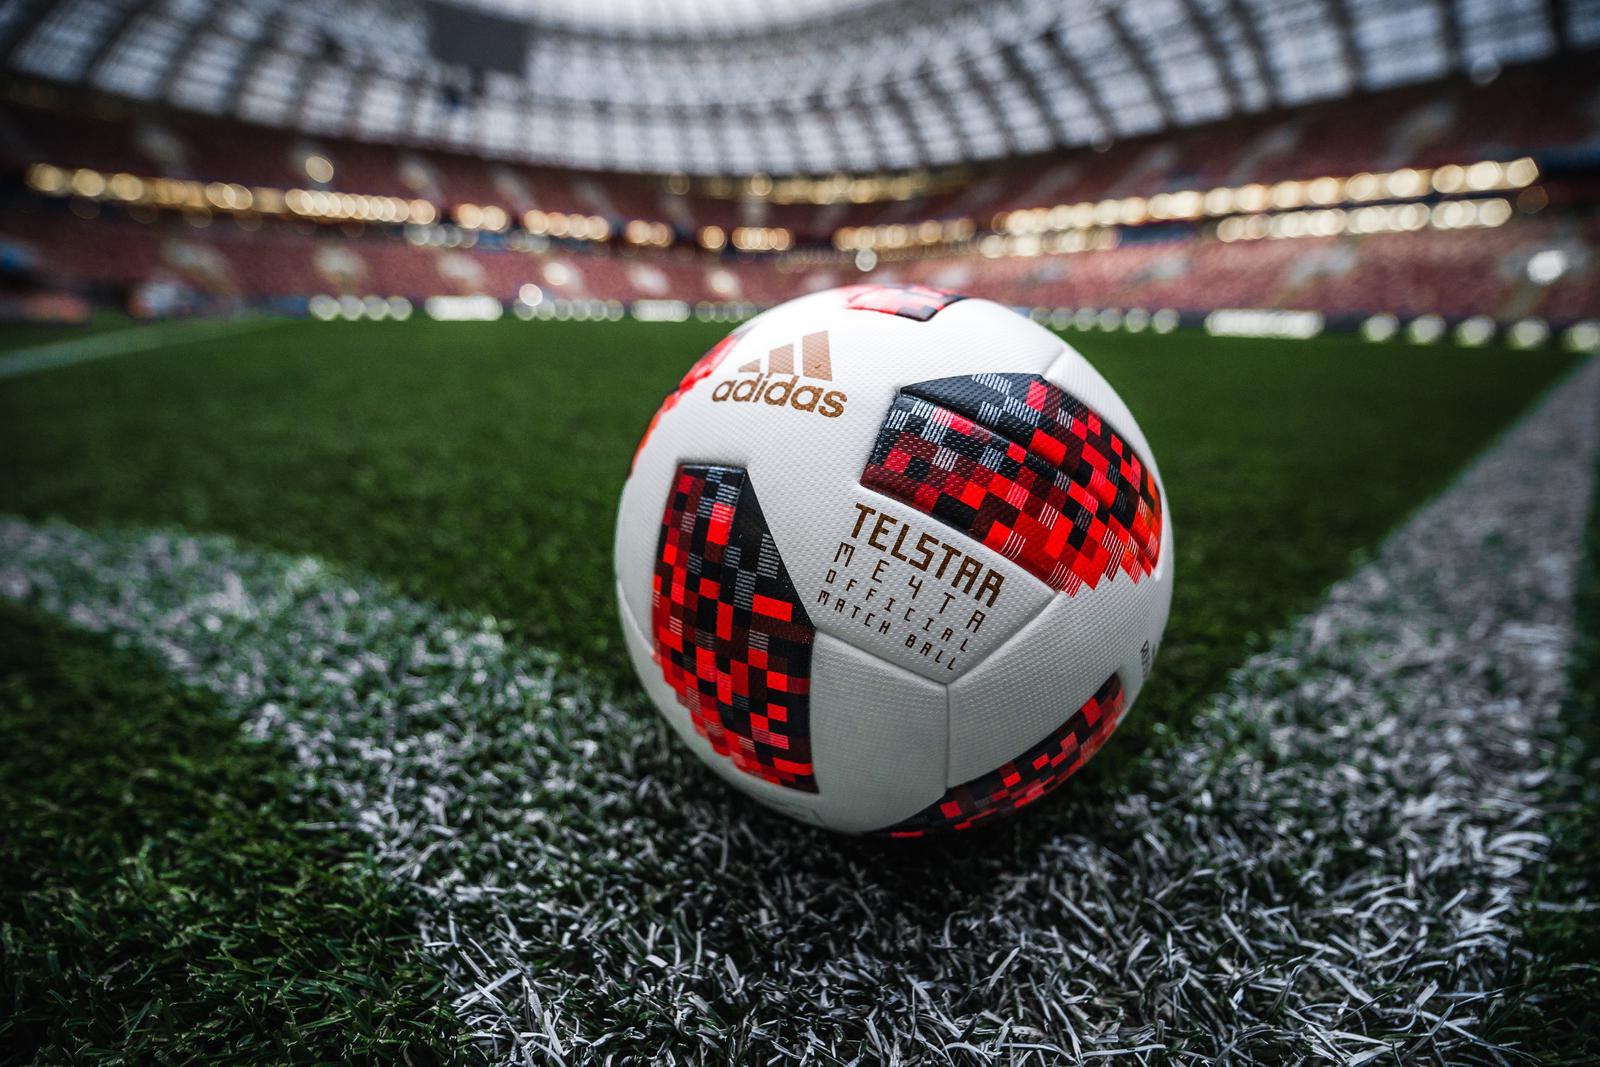 adidas-telstar-mechta-2018-world-cup-kno